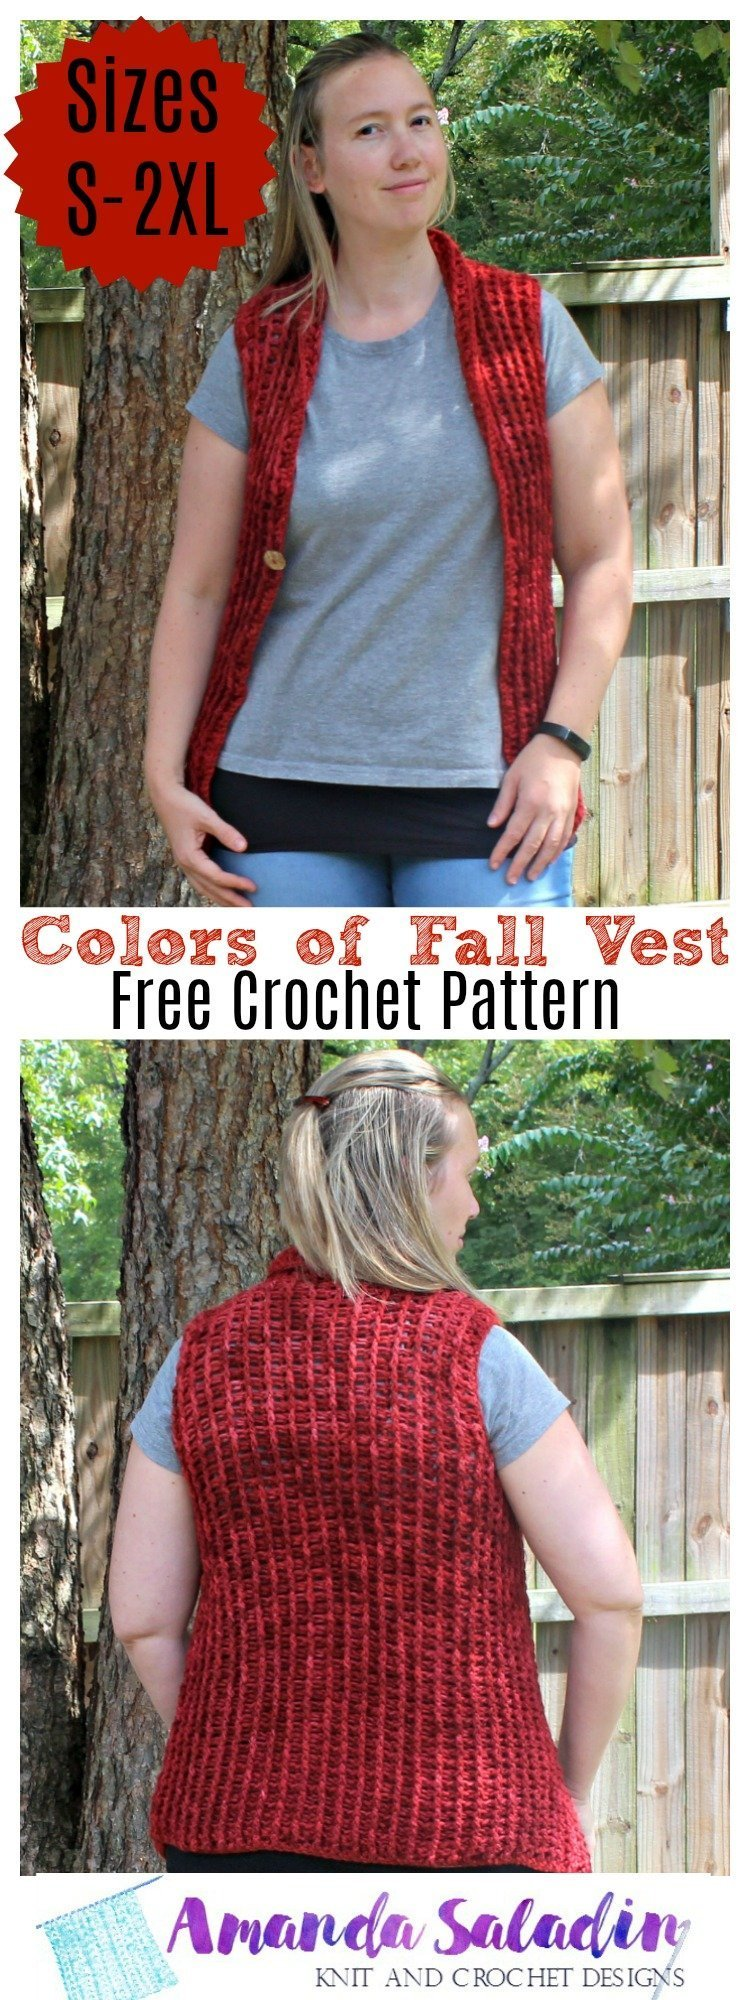 free crochet pattern - colors of fall vest